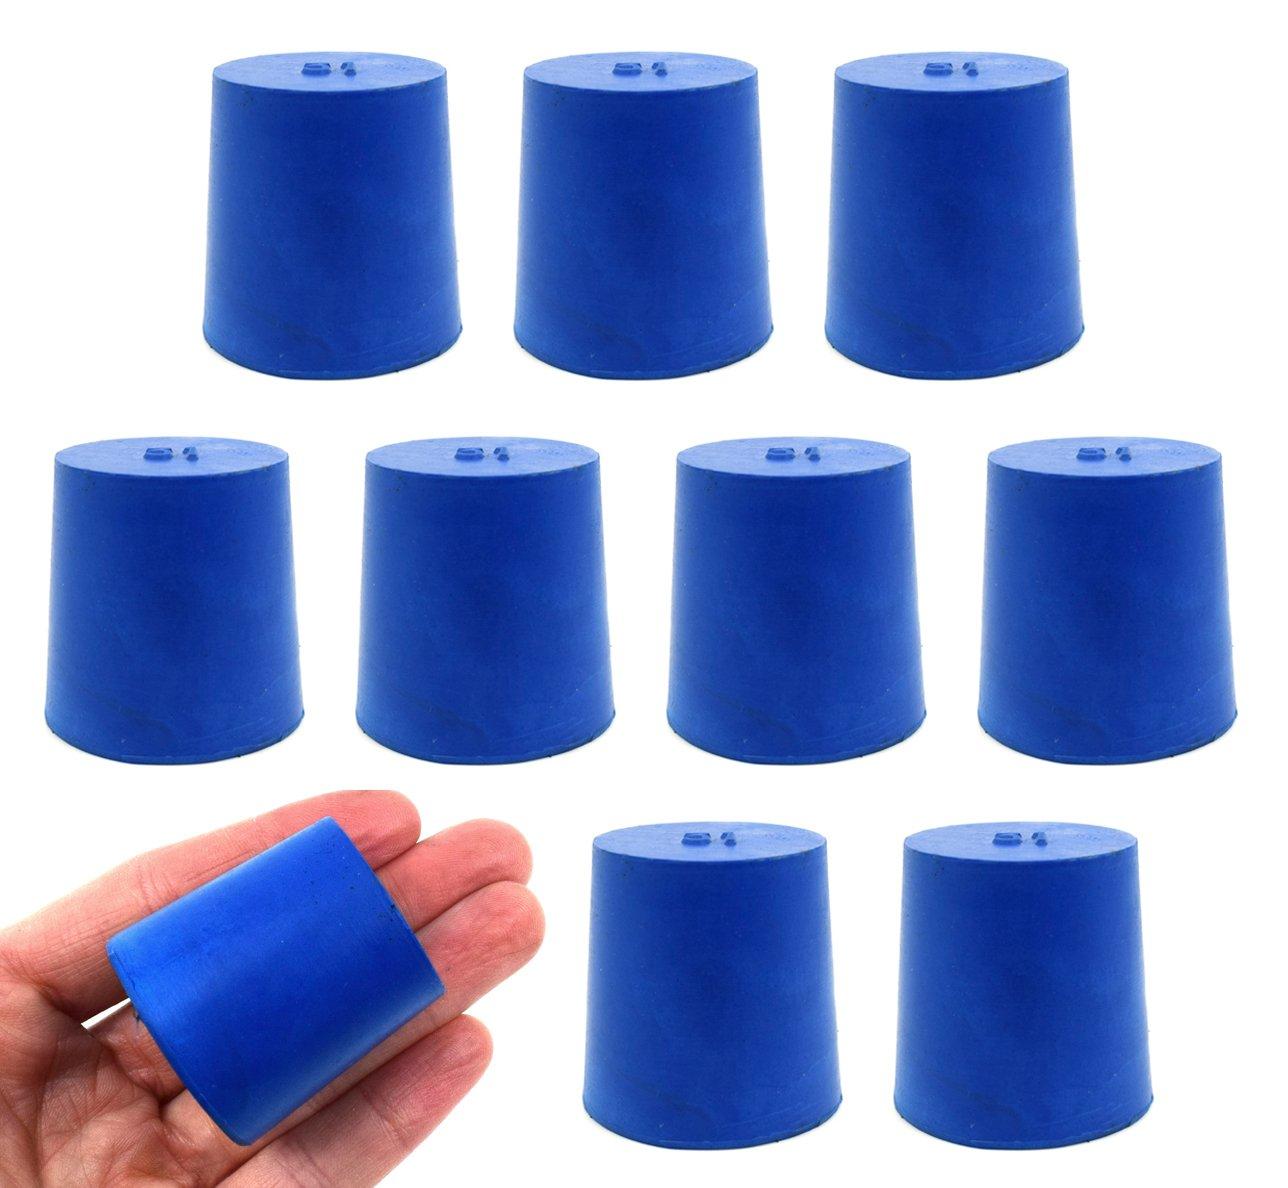 Neoprene Stopper Solid - Blue, Size: 31mm Bottom, 36mm Top, 35mm Length - Pack of 10